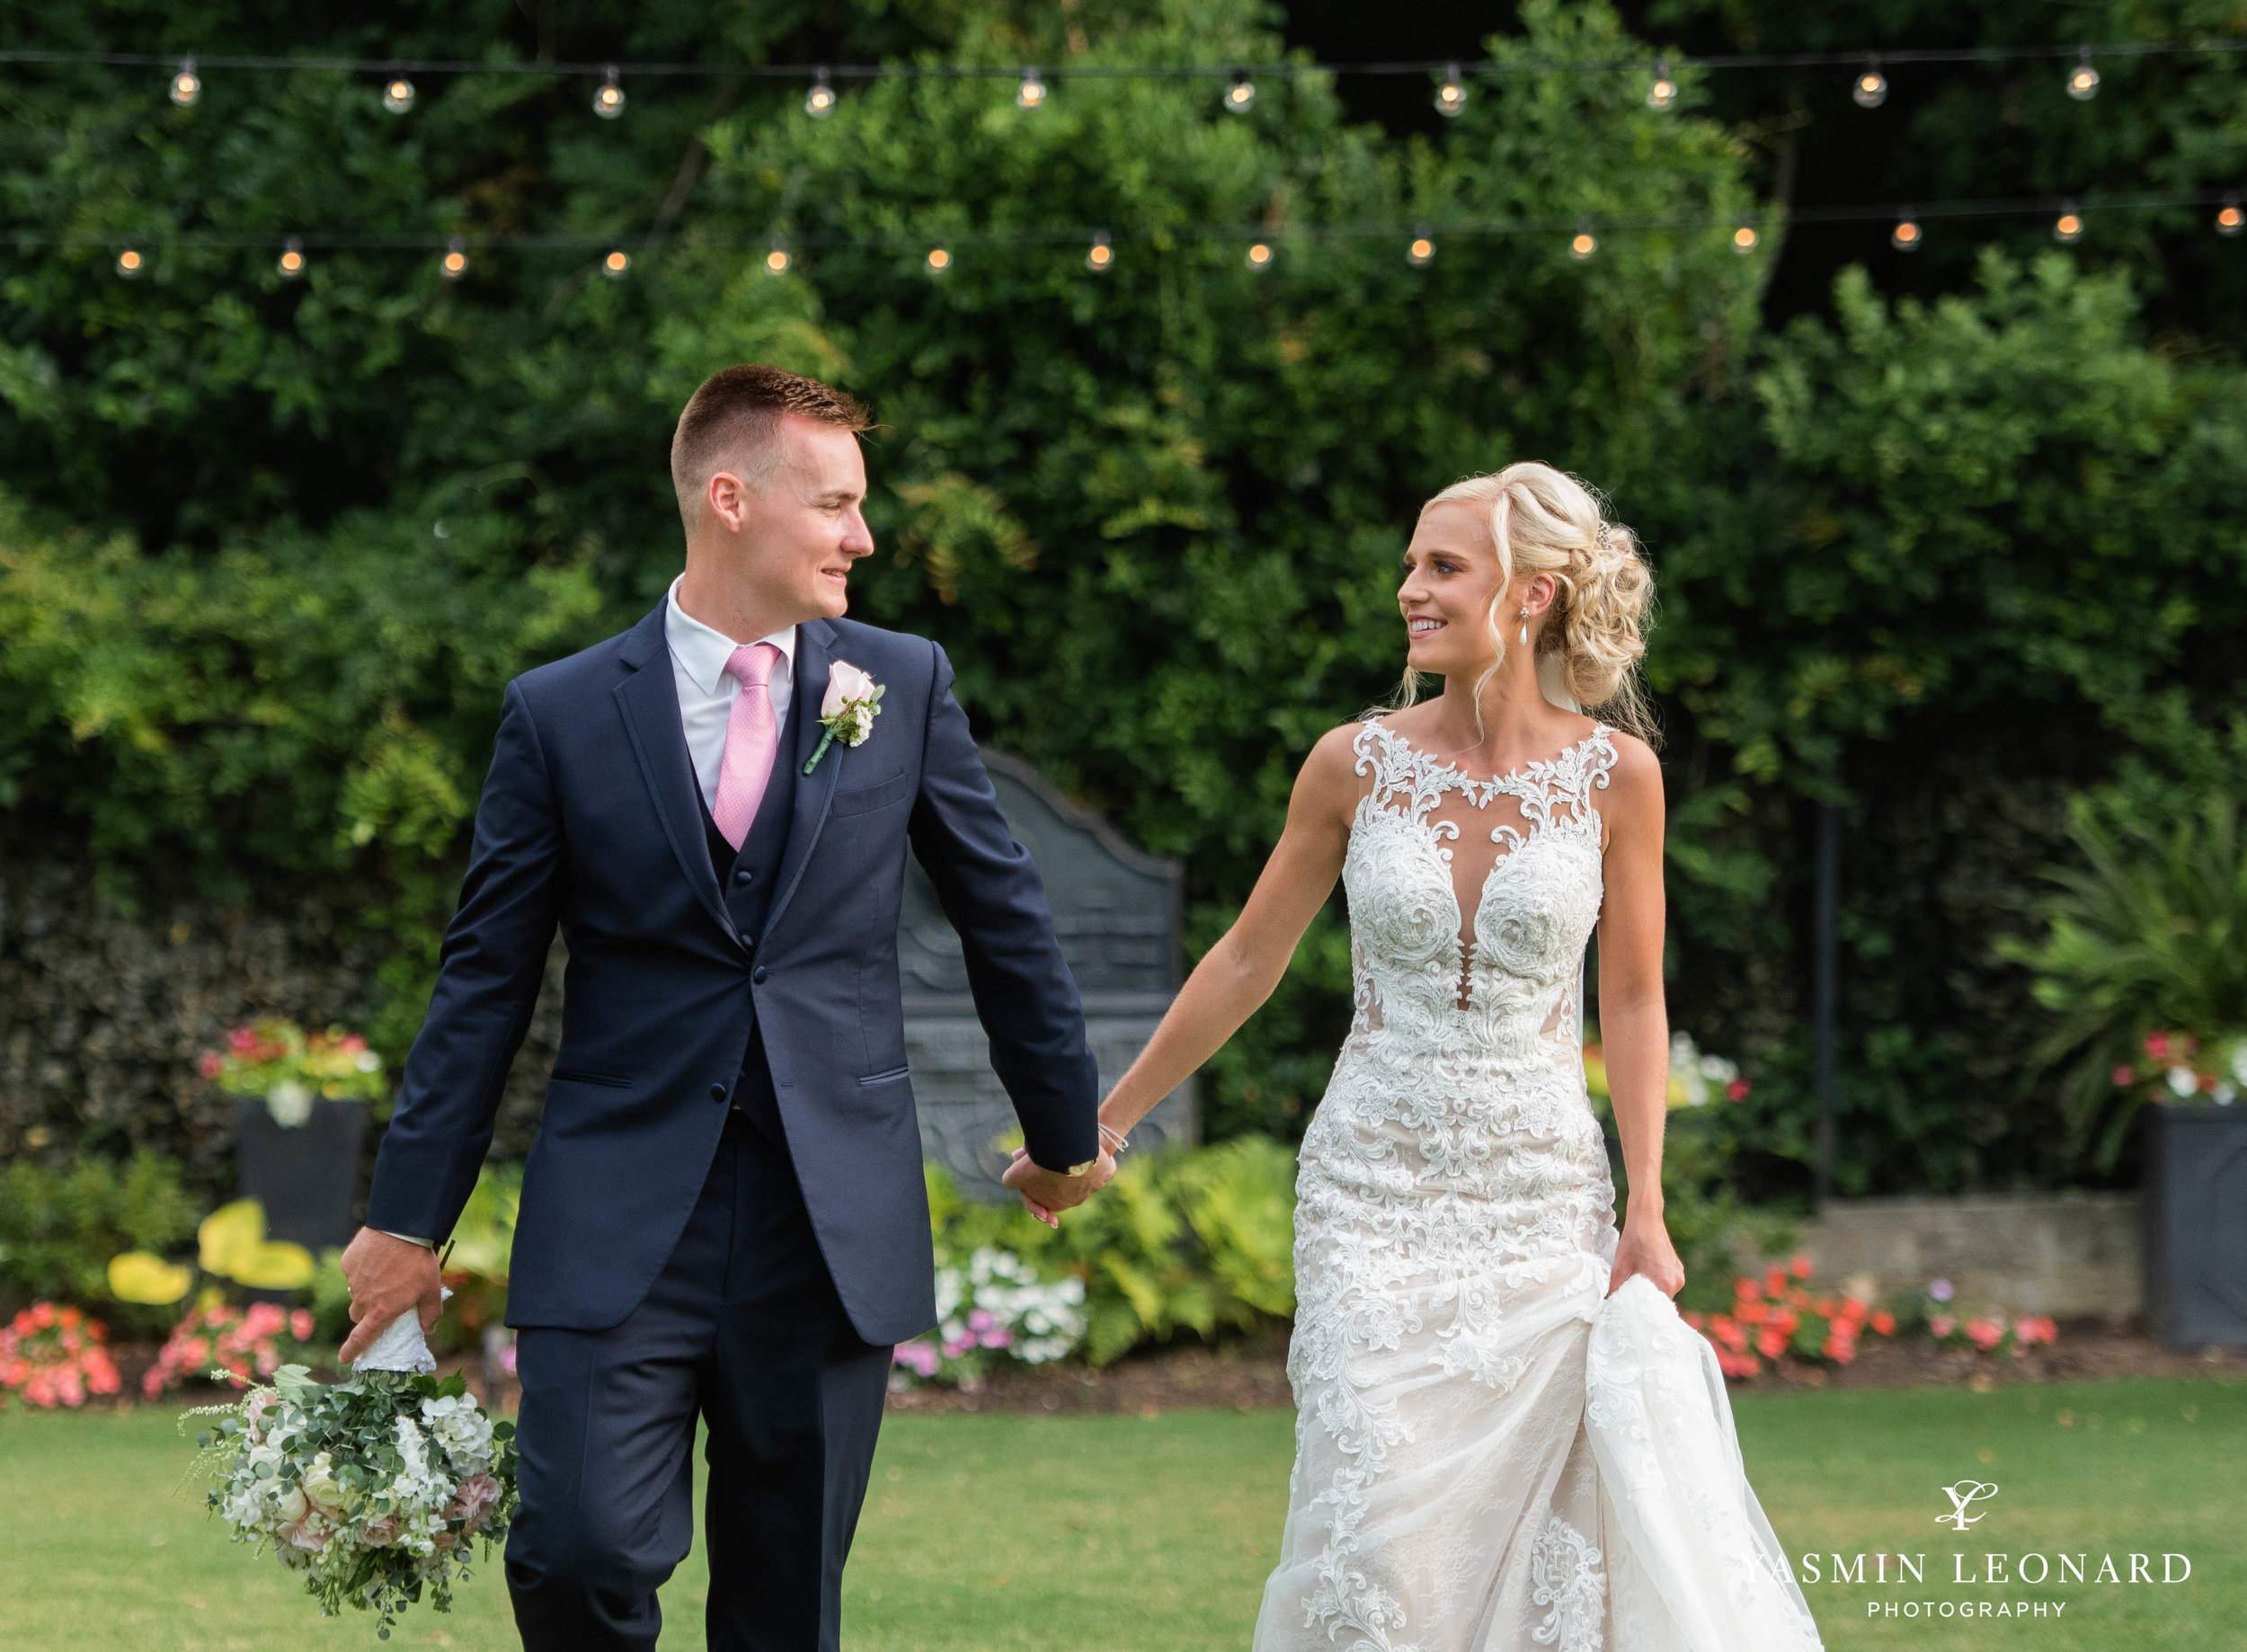 Separk Mansion - NC Weddings - Gastonia Wedding - NC Wedding Venues - Pink and Blue Wedding Ideas - Pink Bridesmaid Dresses - Yasmin Leonard Photography-27.jpg